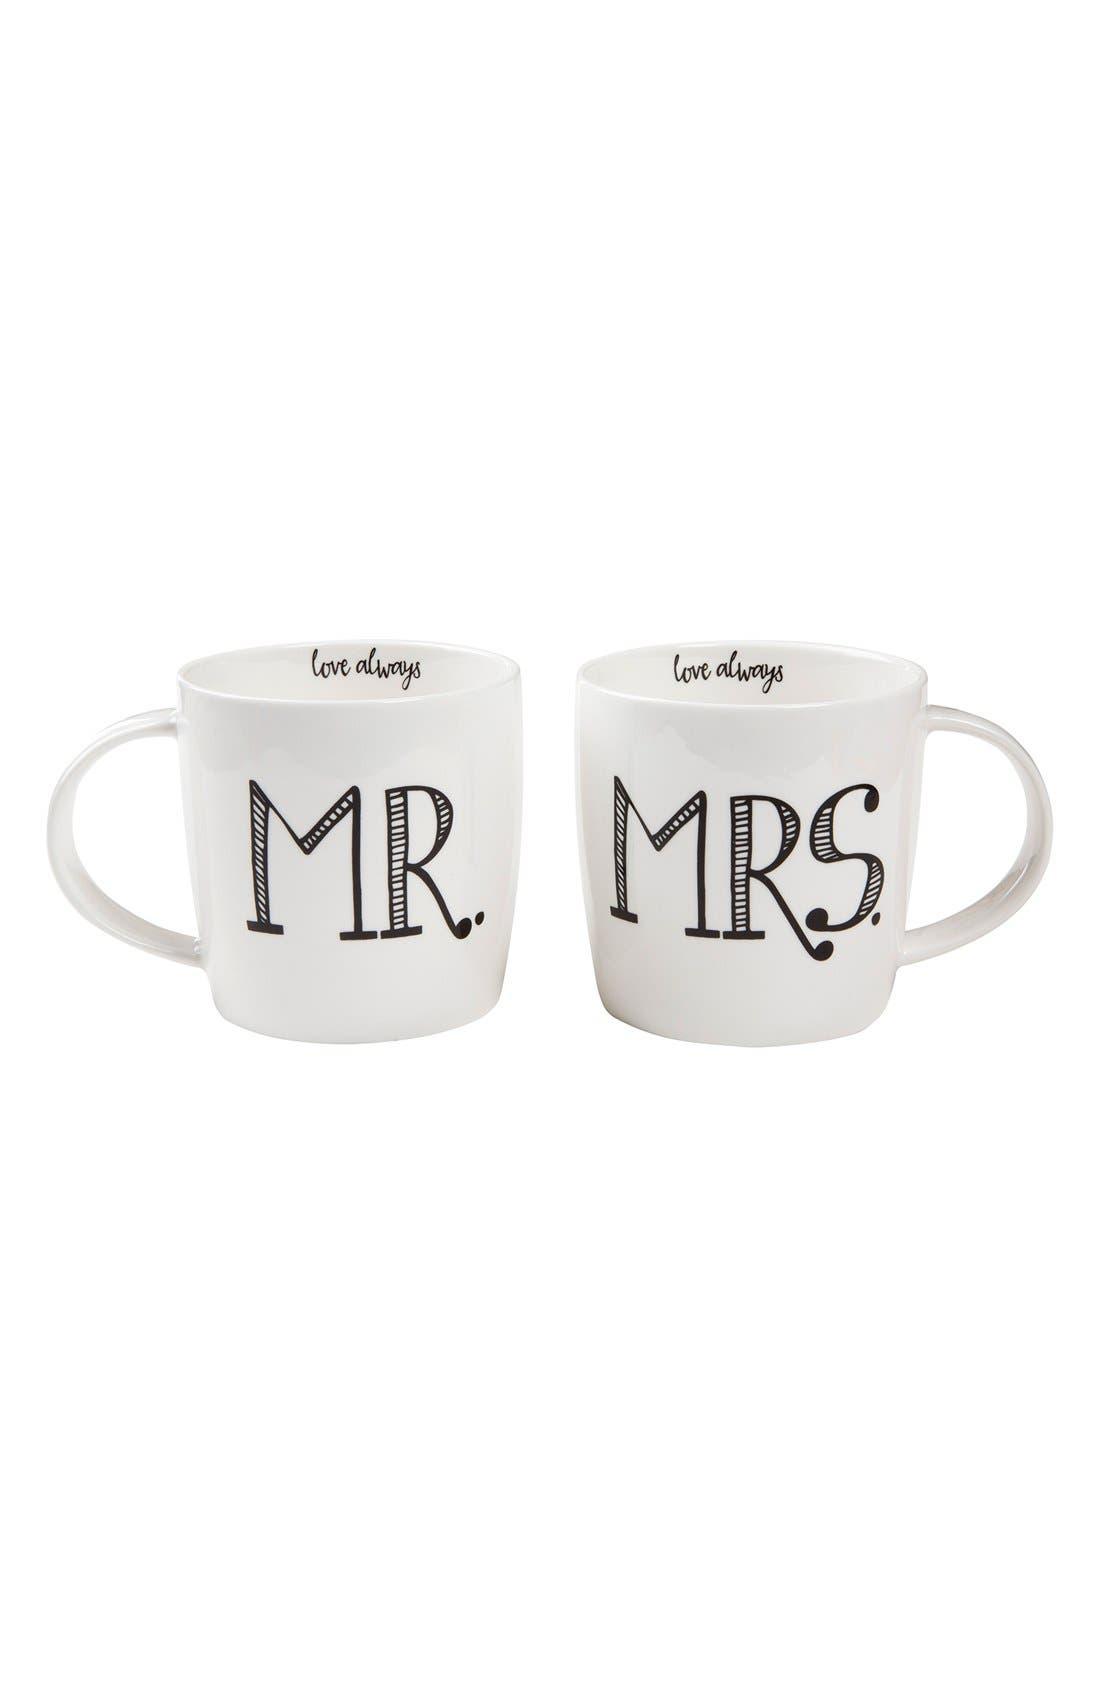 Natural Life 'Mr. & Mrs. - Love Always' Ceramic Mug Set